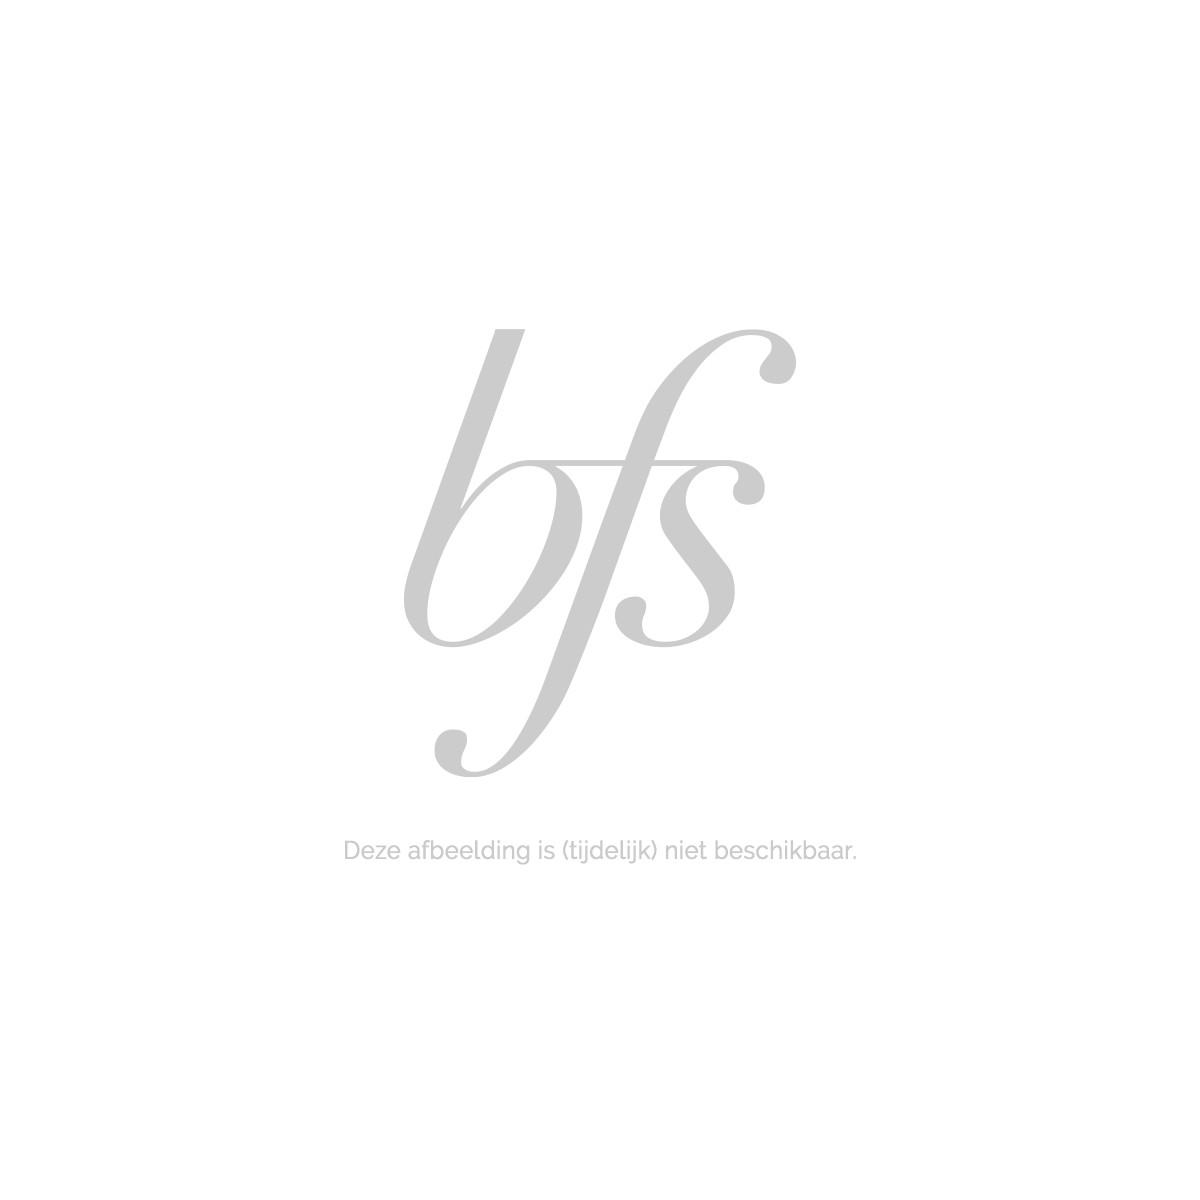 Banila Hello Sunny Essence Sun Stick Spf50+ Pa++++ Glow